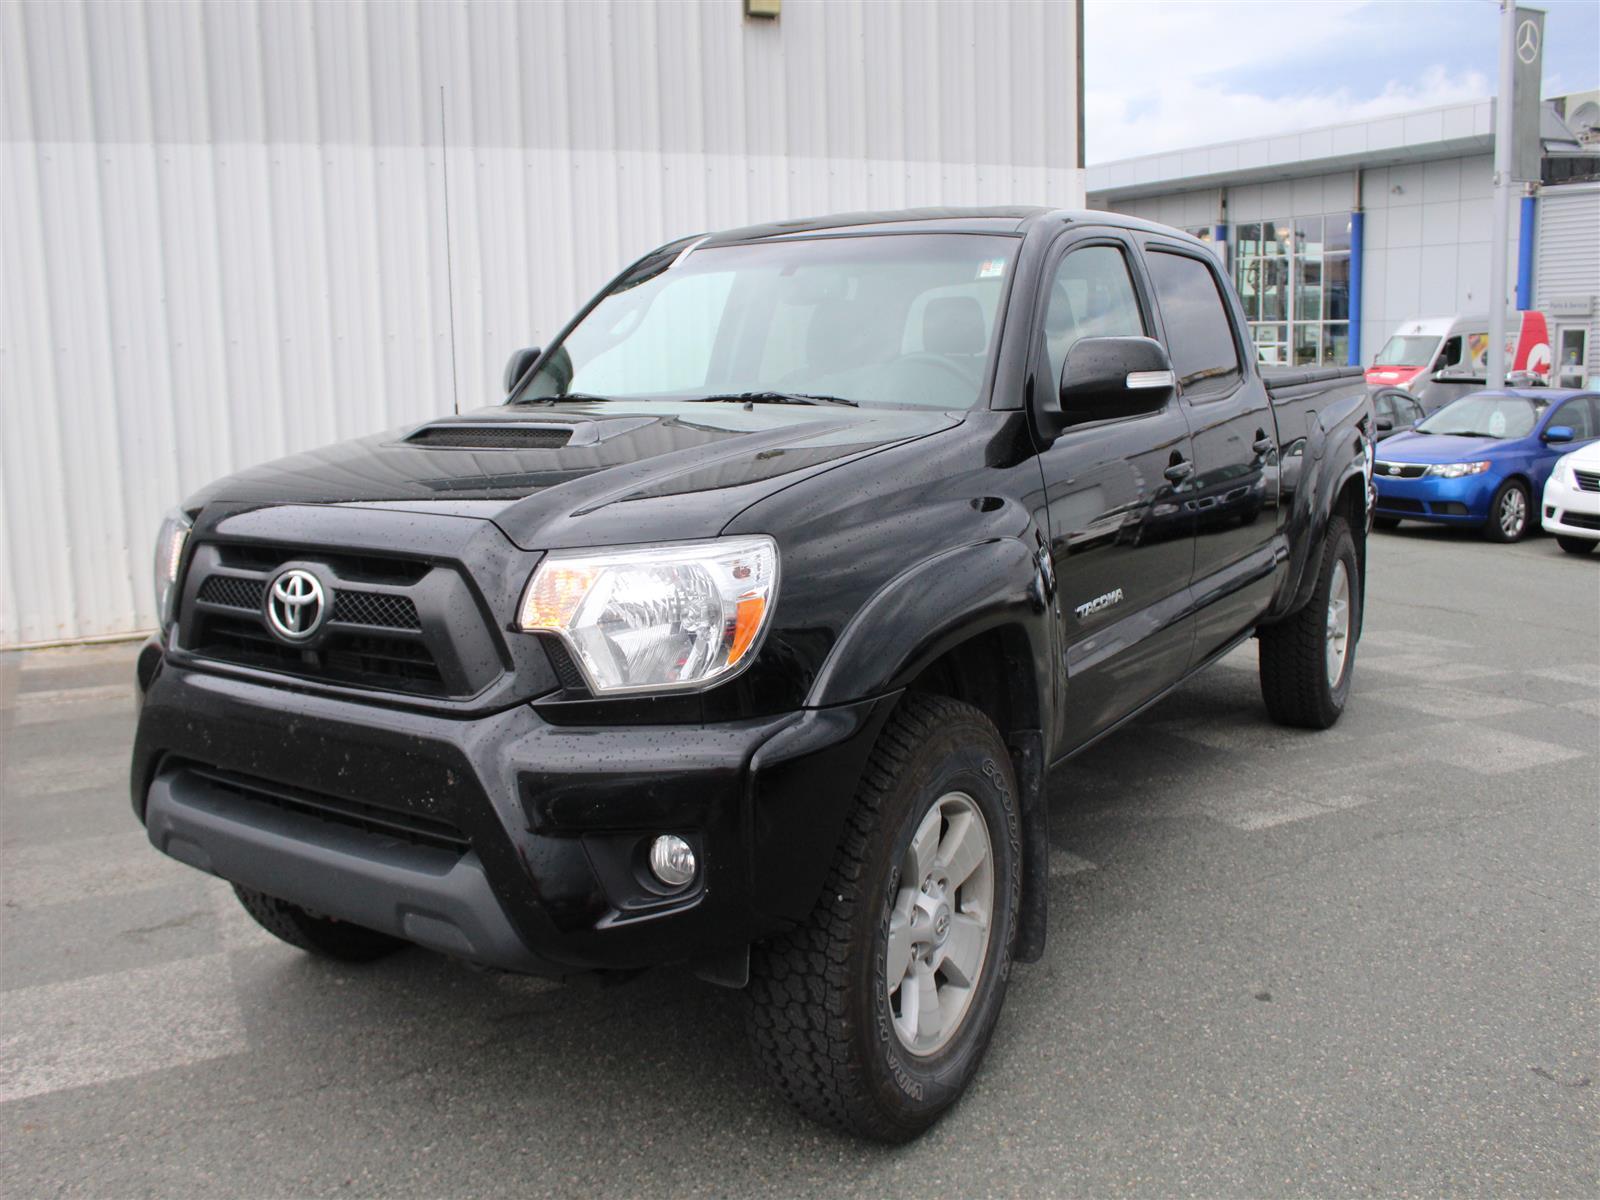 2013 Toyota Tacoma TRD P14719